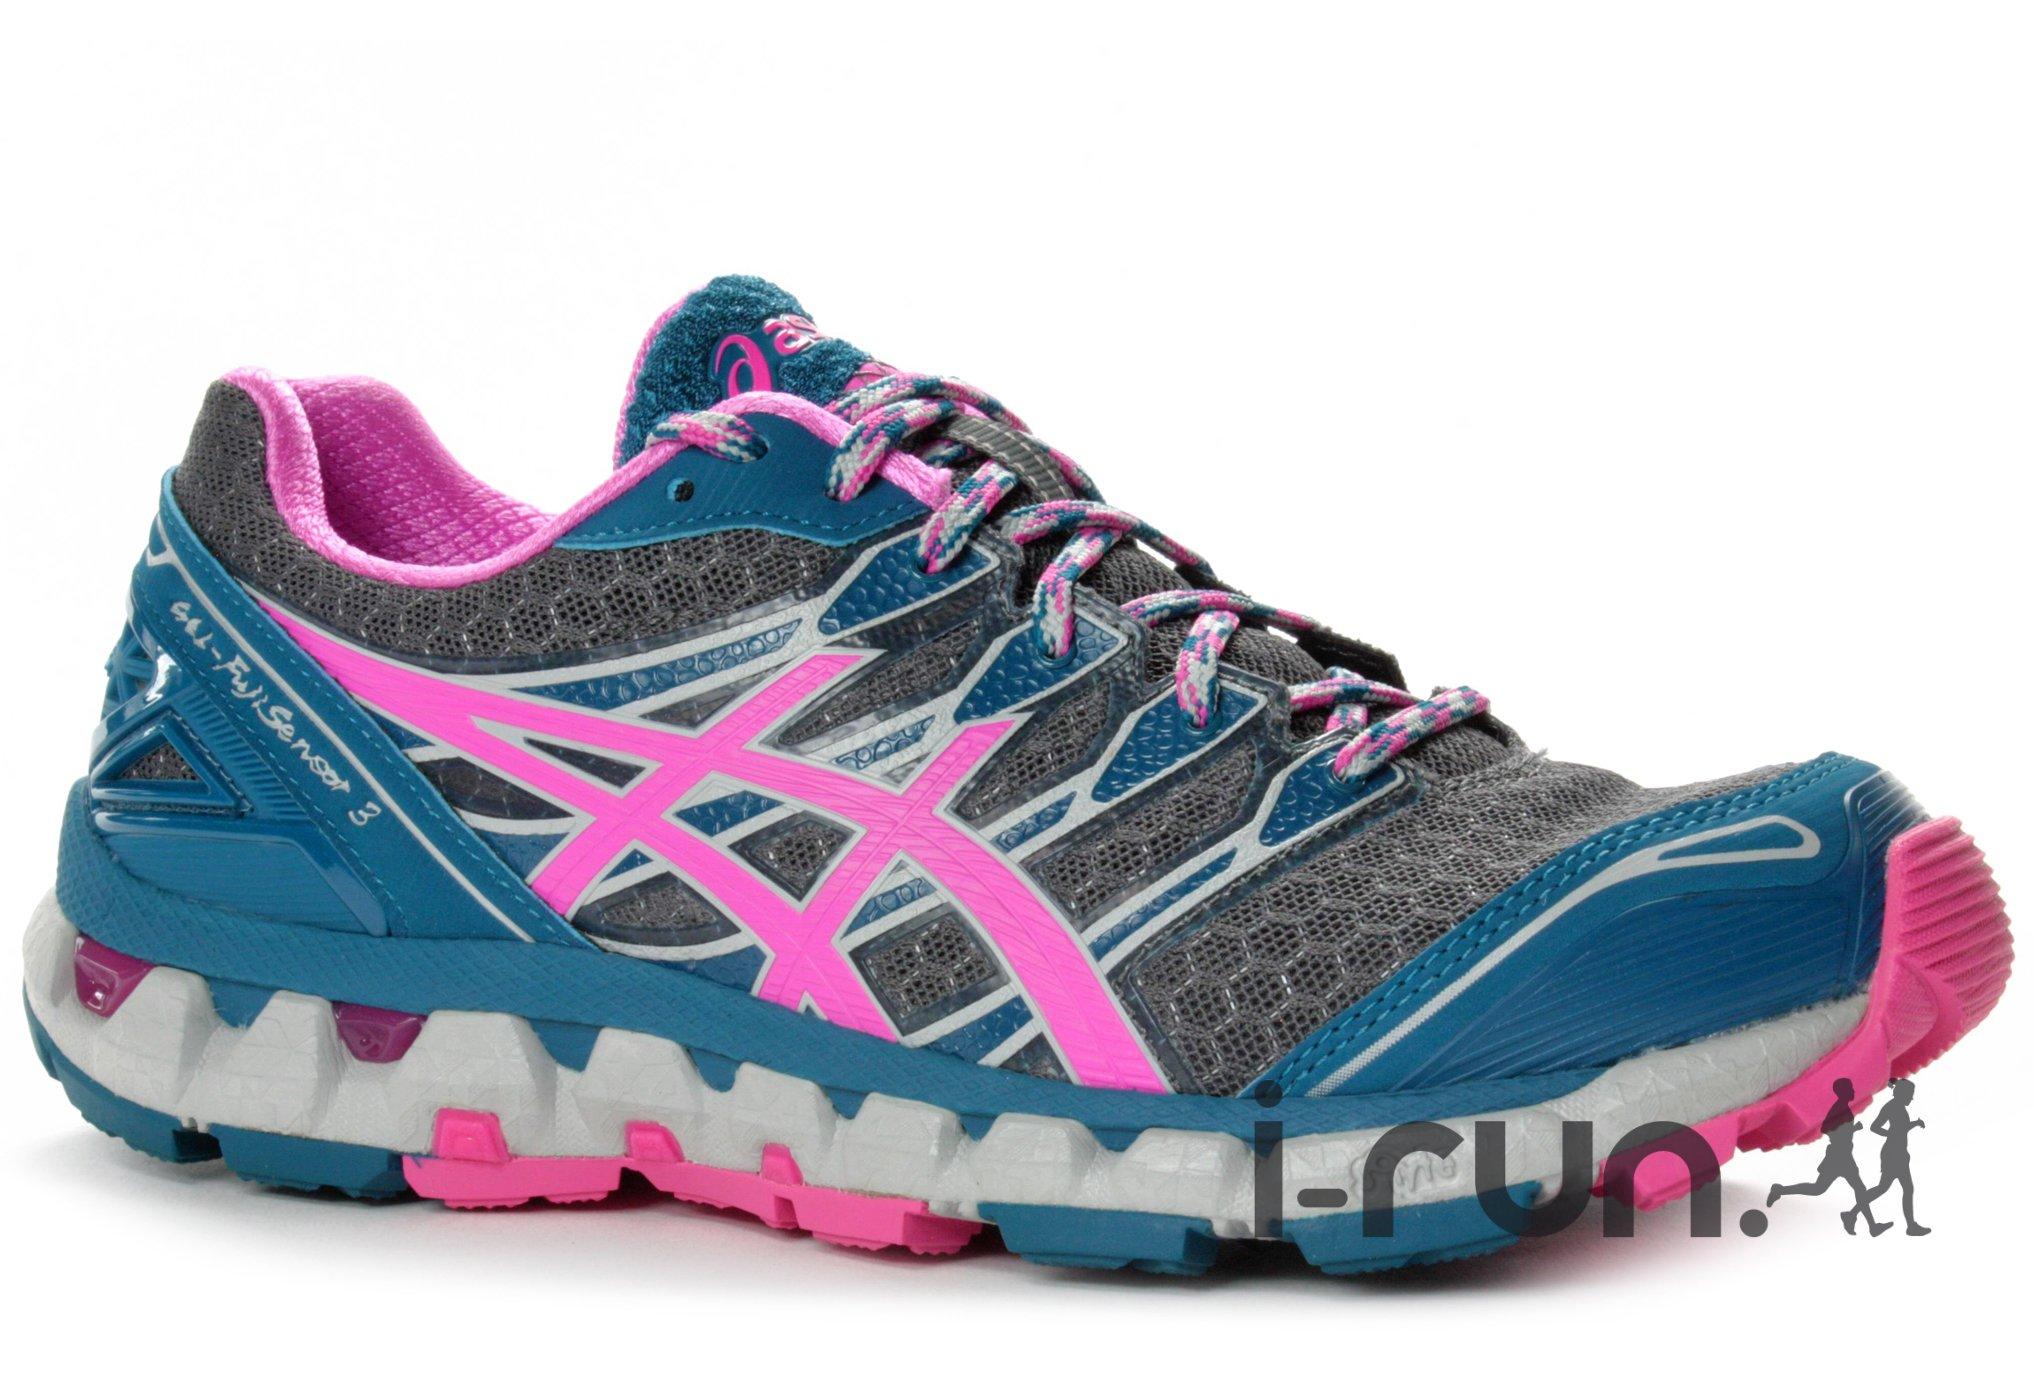 Asics Gel fuji sensor 3 w diététique chaussures femme